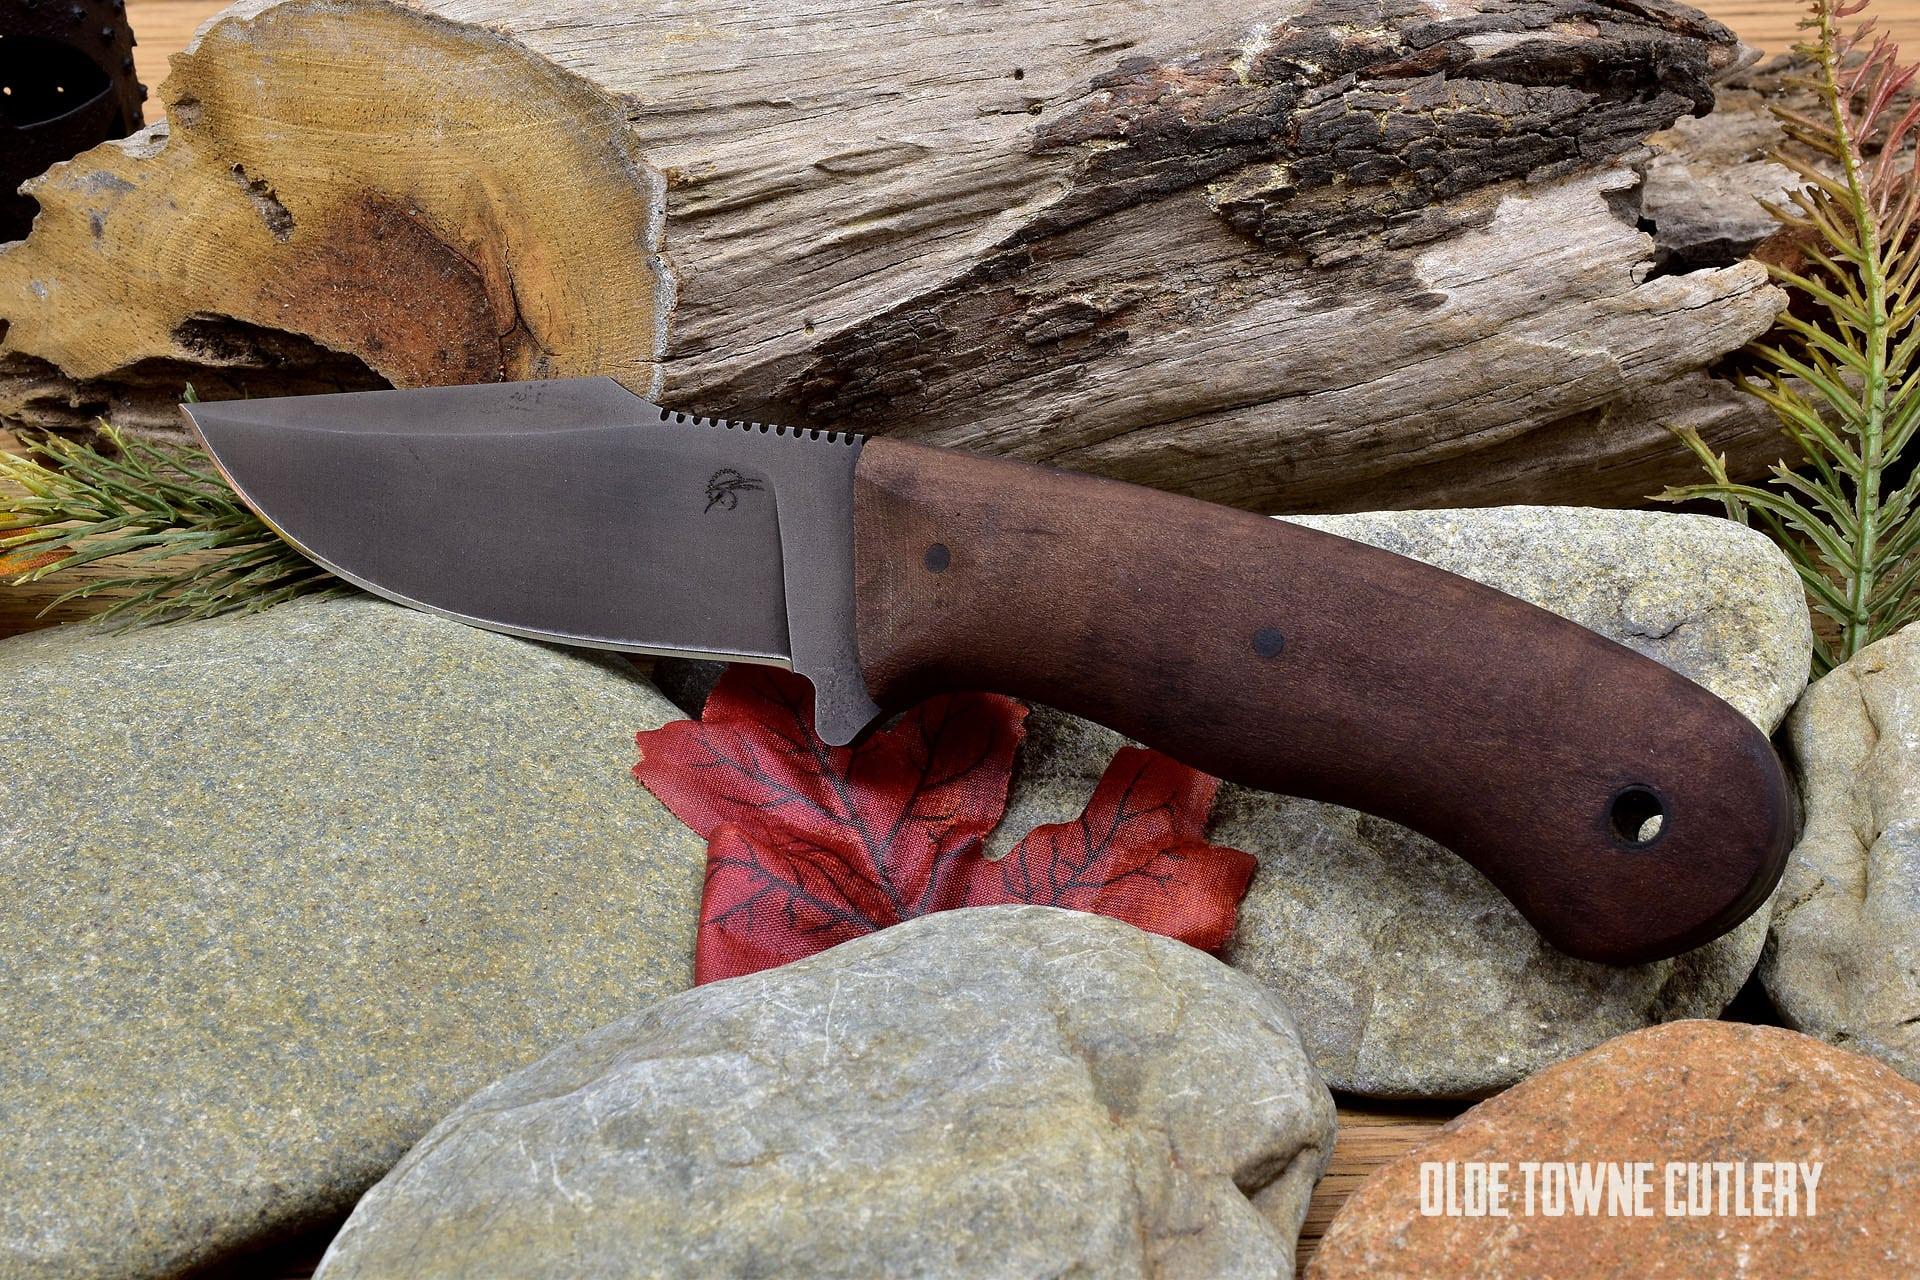 Winkler/Jason Knight Jaeger Maple handle